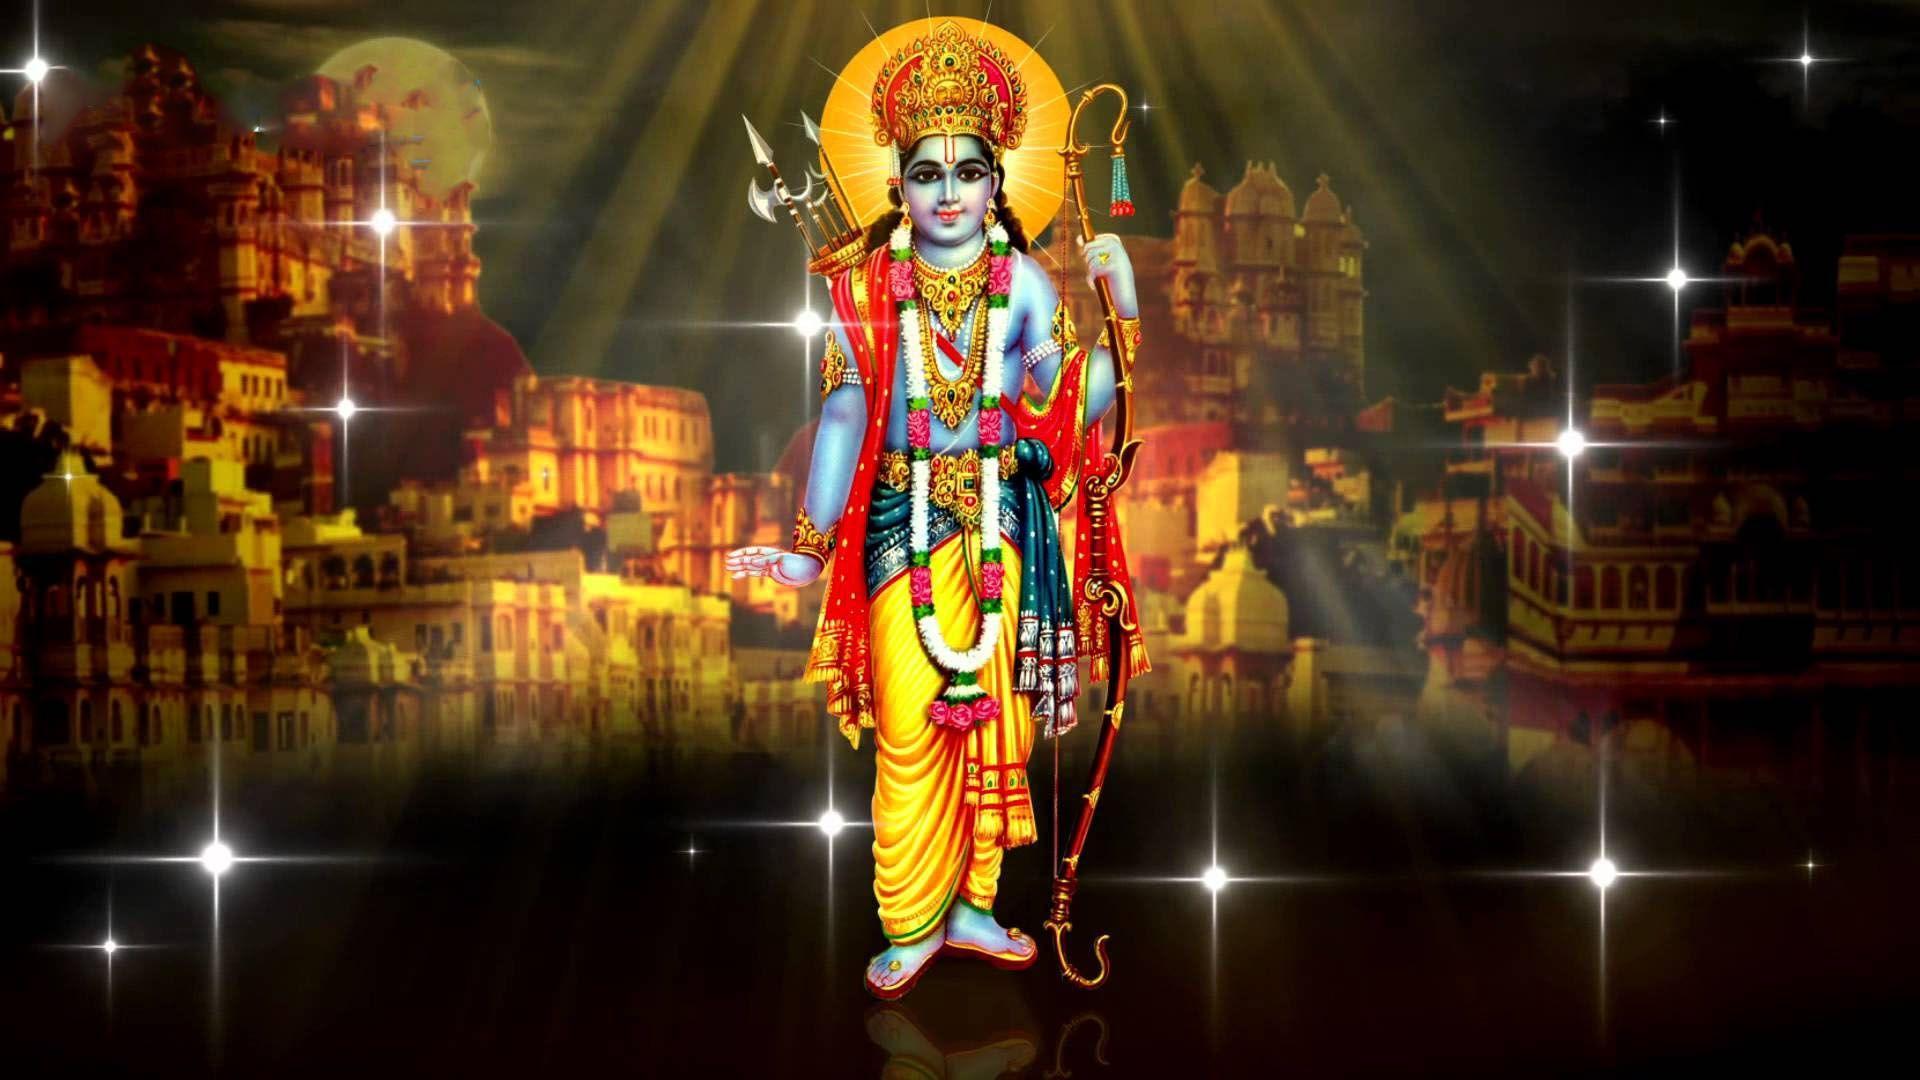 1920x1080 Shri Ram HD Wallpaper Tải xuống miễn phí - Jai Shri Ram Wallpaper Full